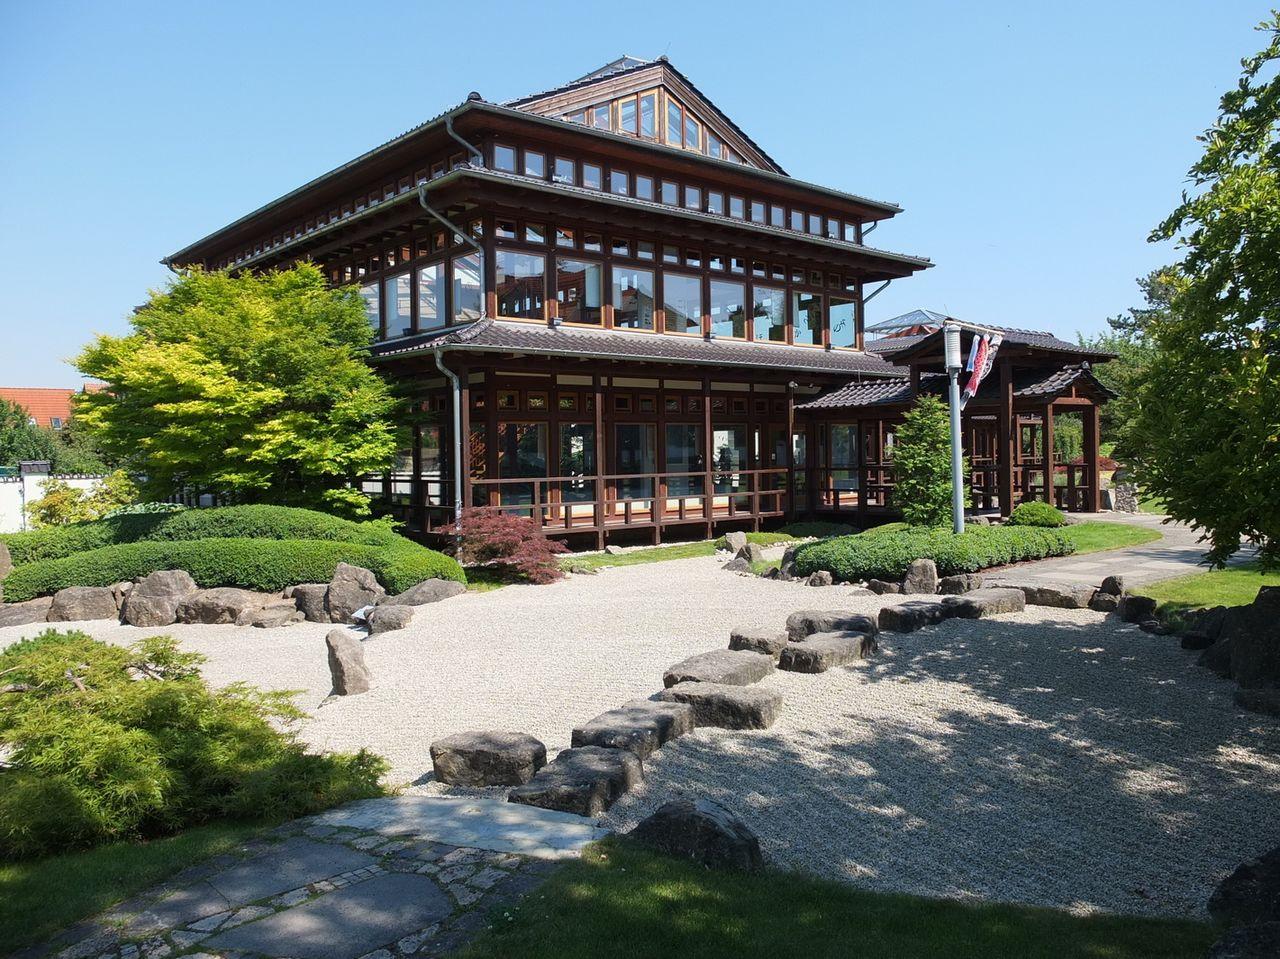 Bild Japanischer Garten Bad Langensalza